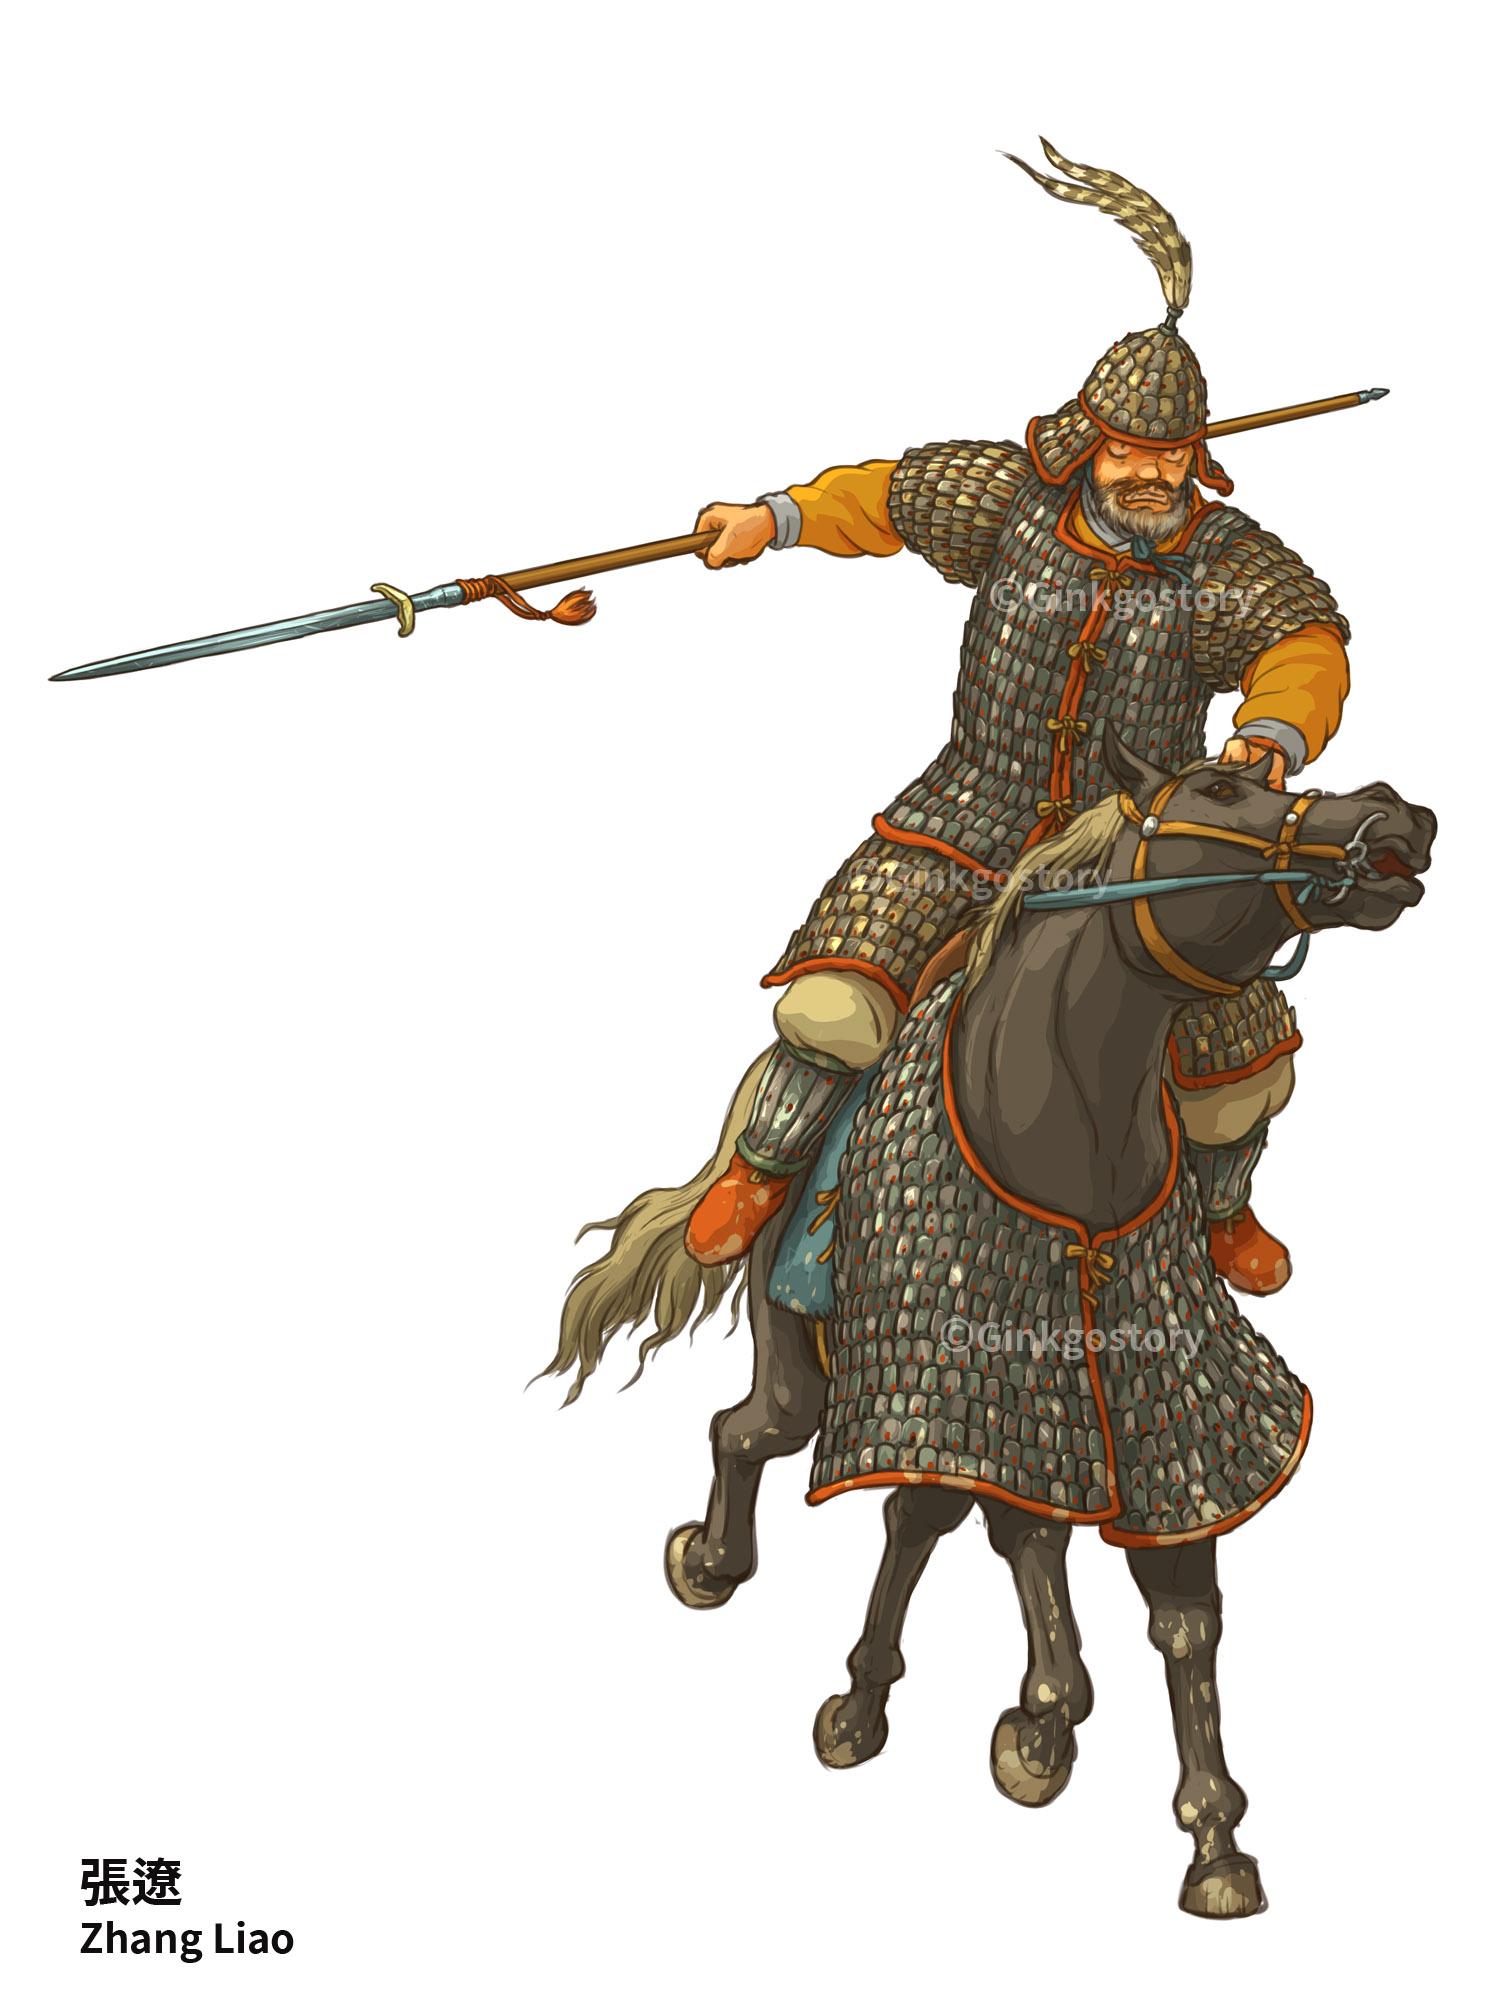 Three Kingdoms: Zhang Liao